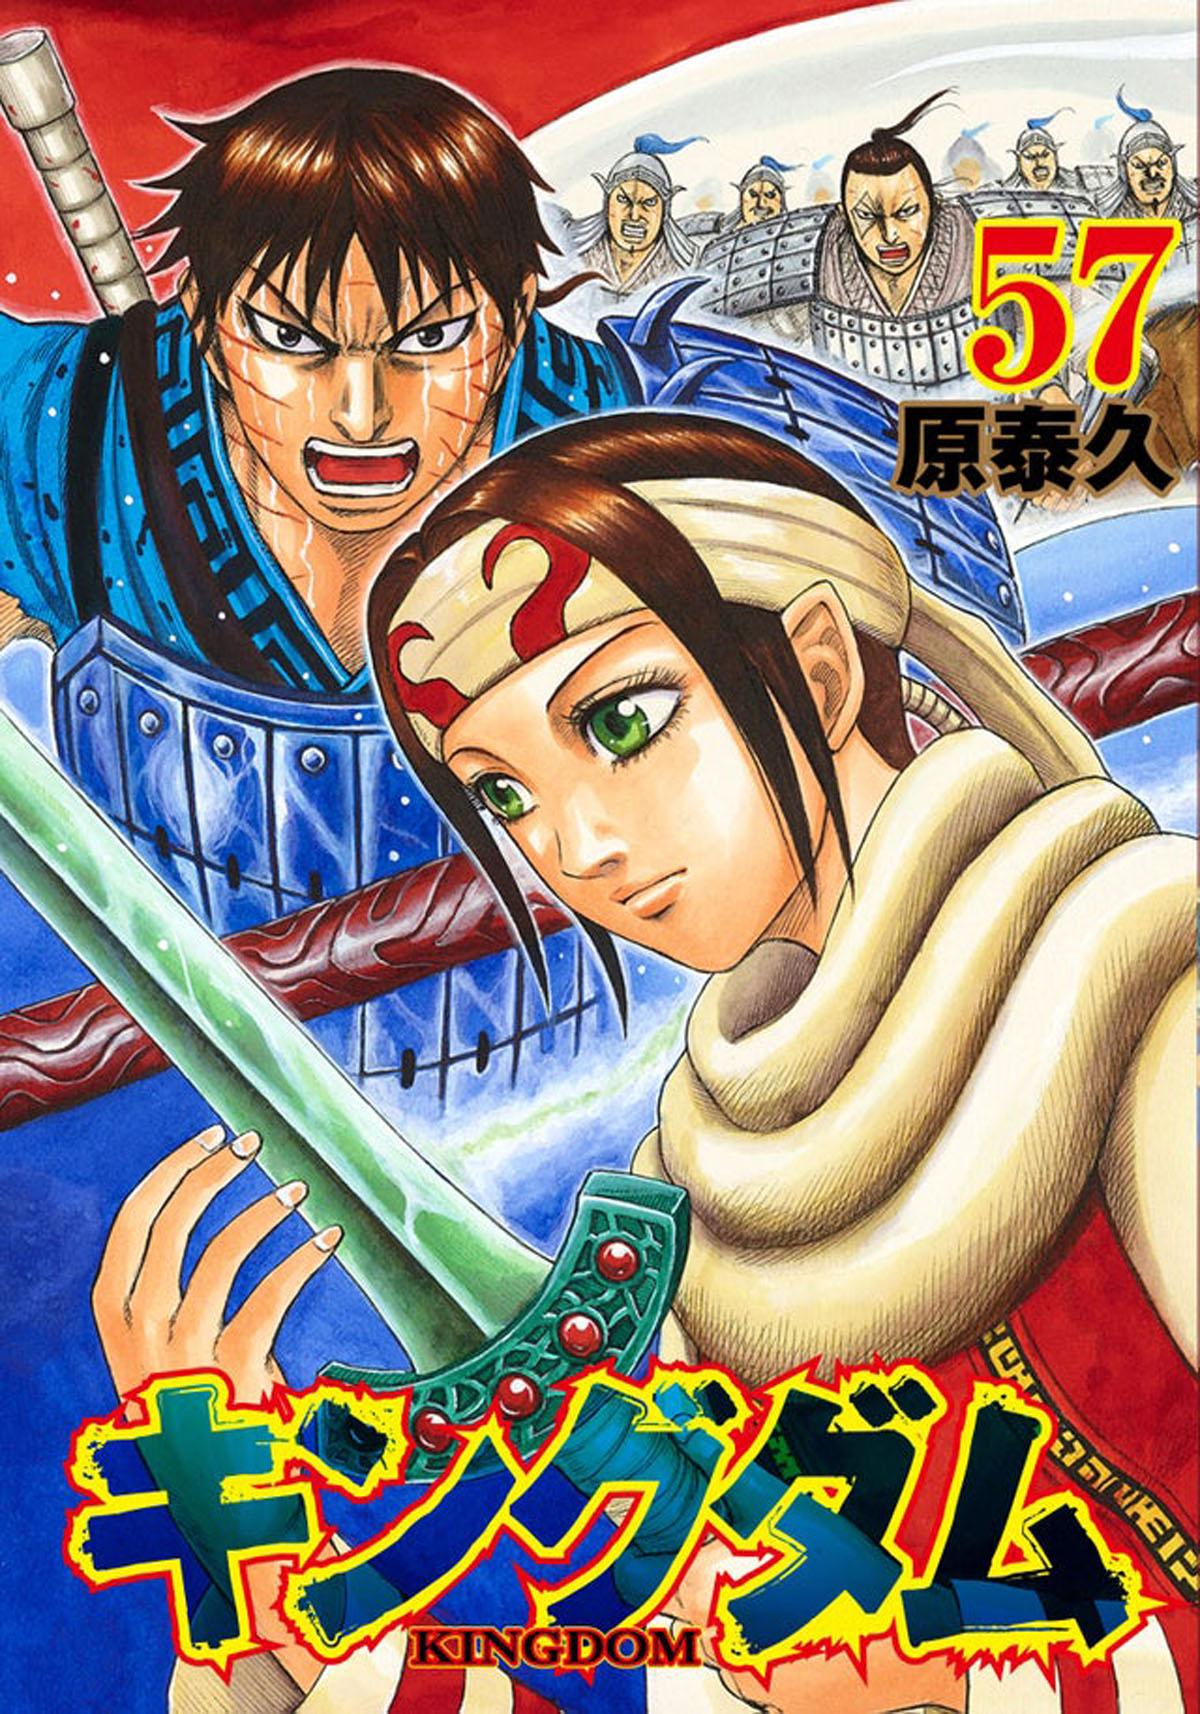 Kingdom Manga Volume 57 Cover Art